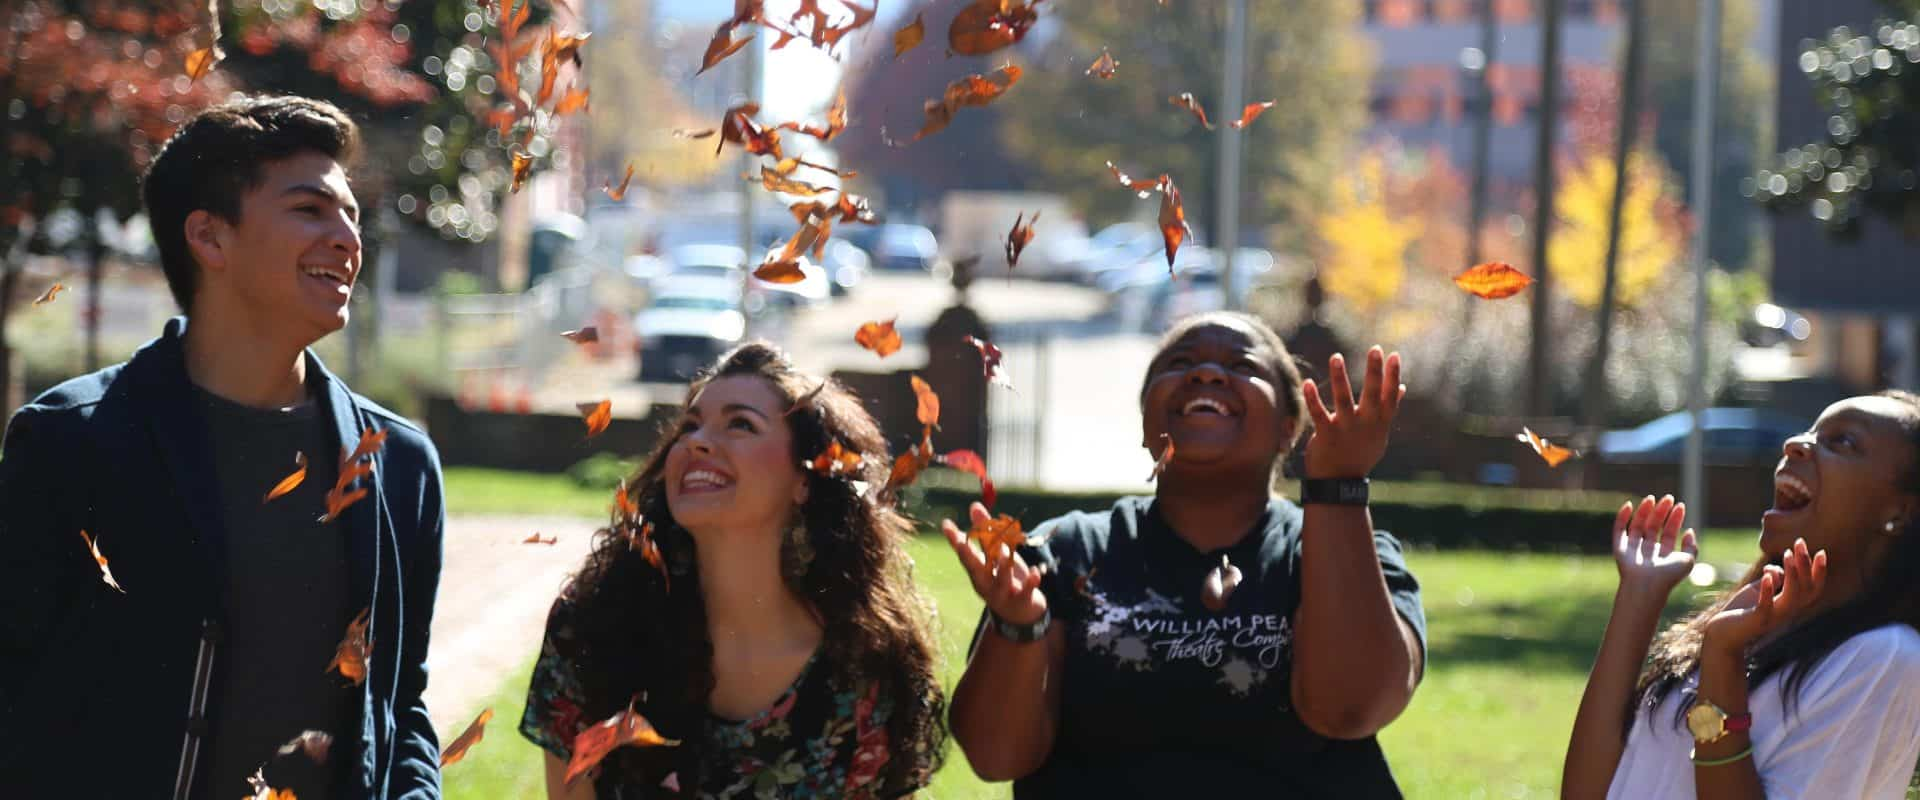 WPU students enjoying the Fall weather.